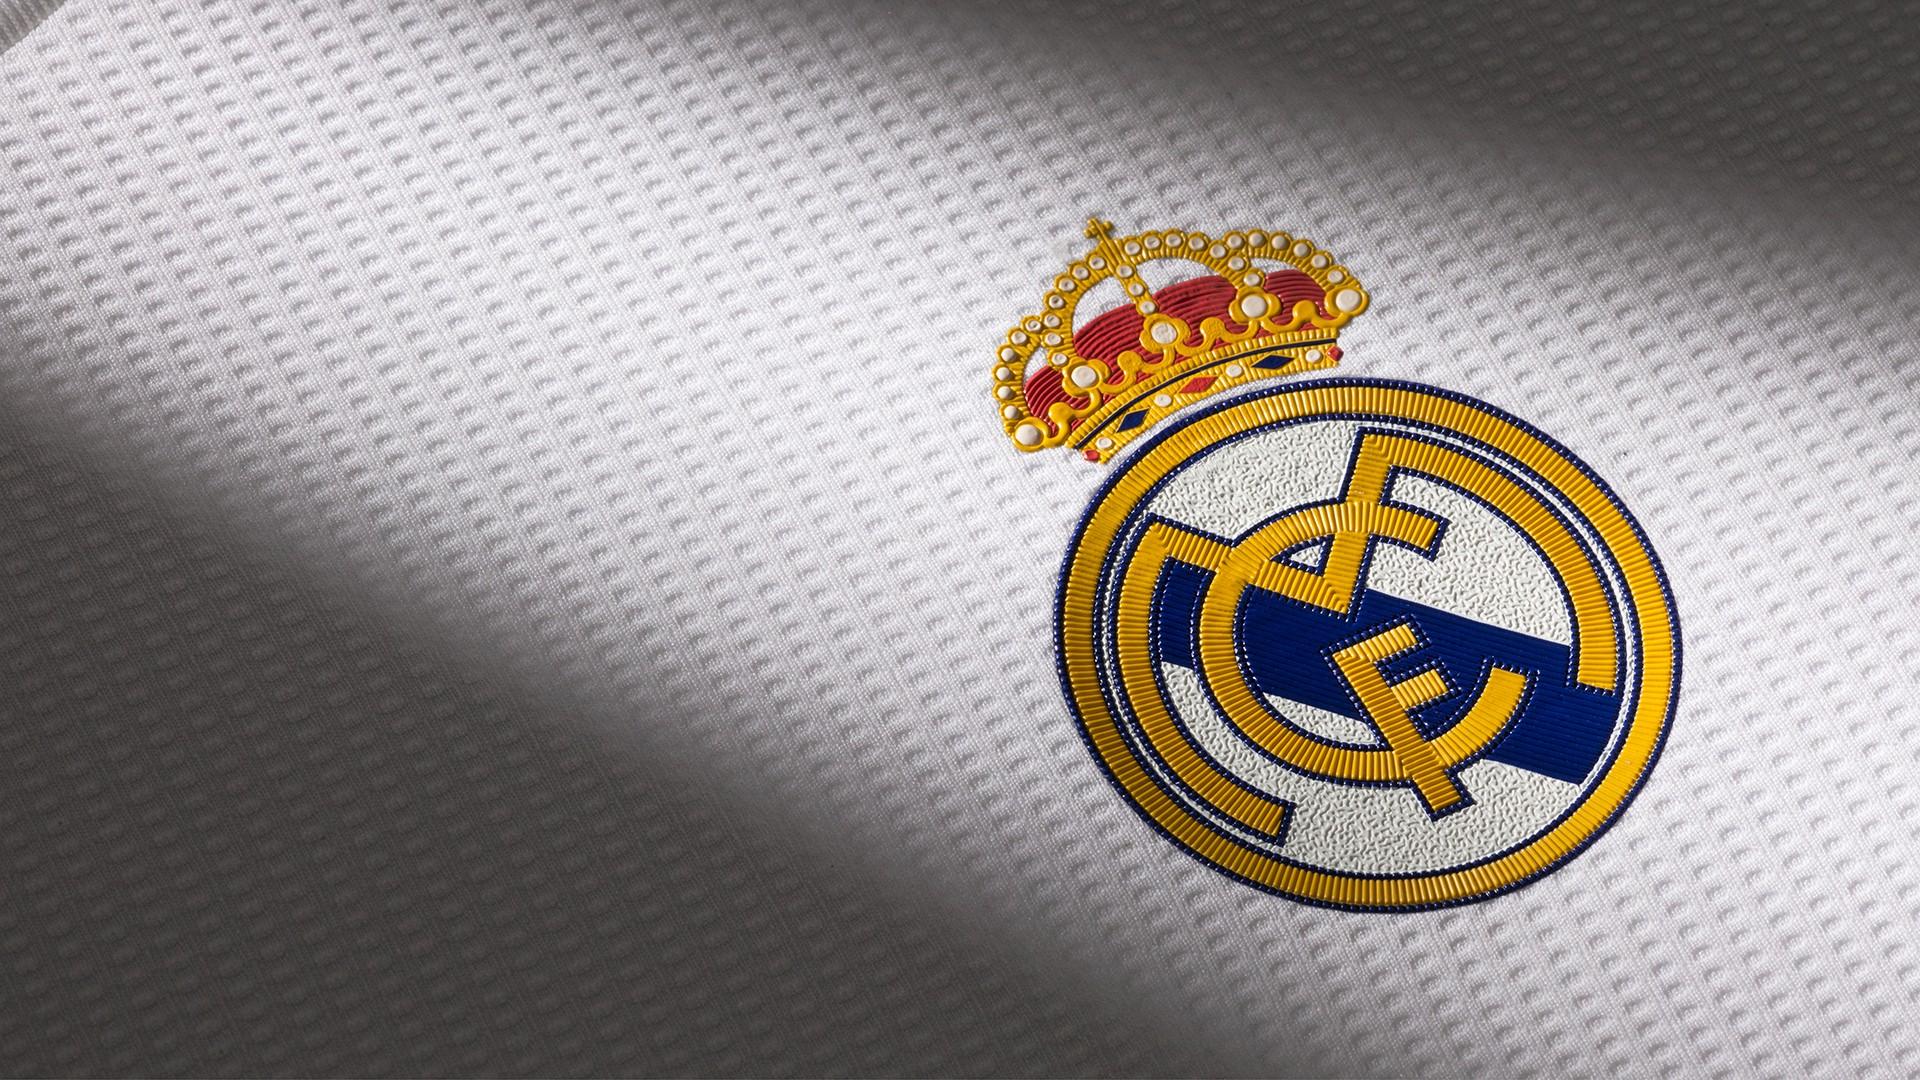 Real Madrid 2015 2016 Kit HD Wallpapers Amazing Cool Desktop 1920x1080